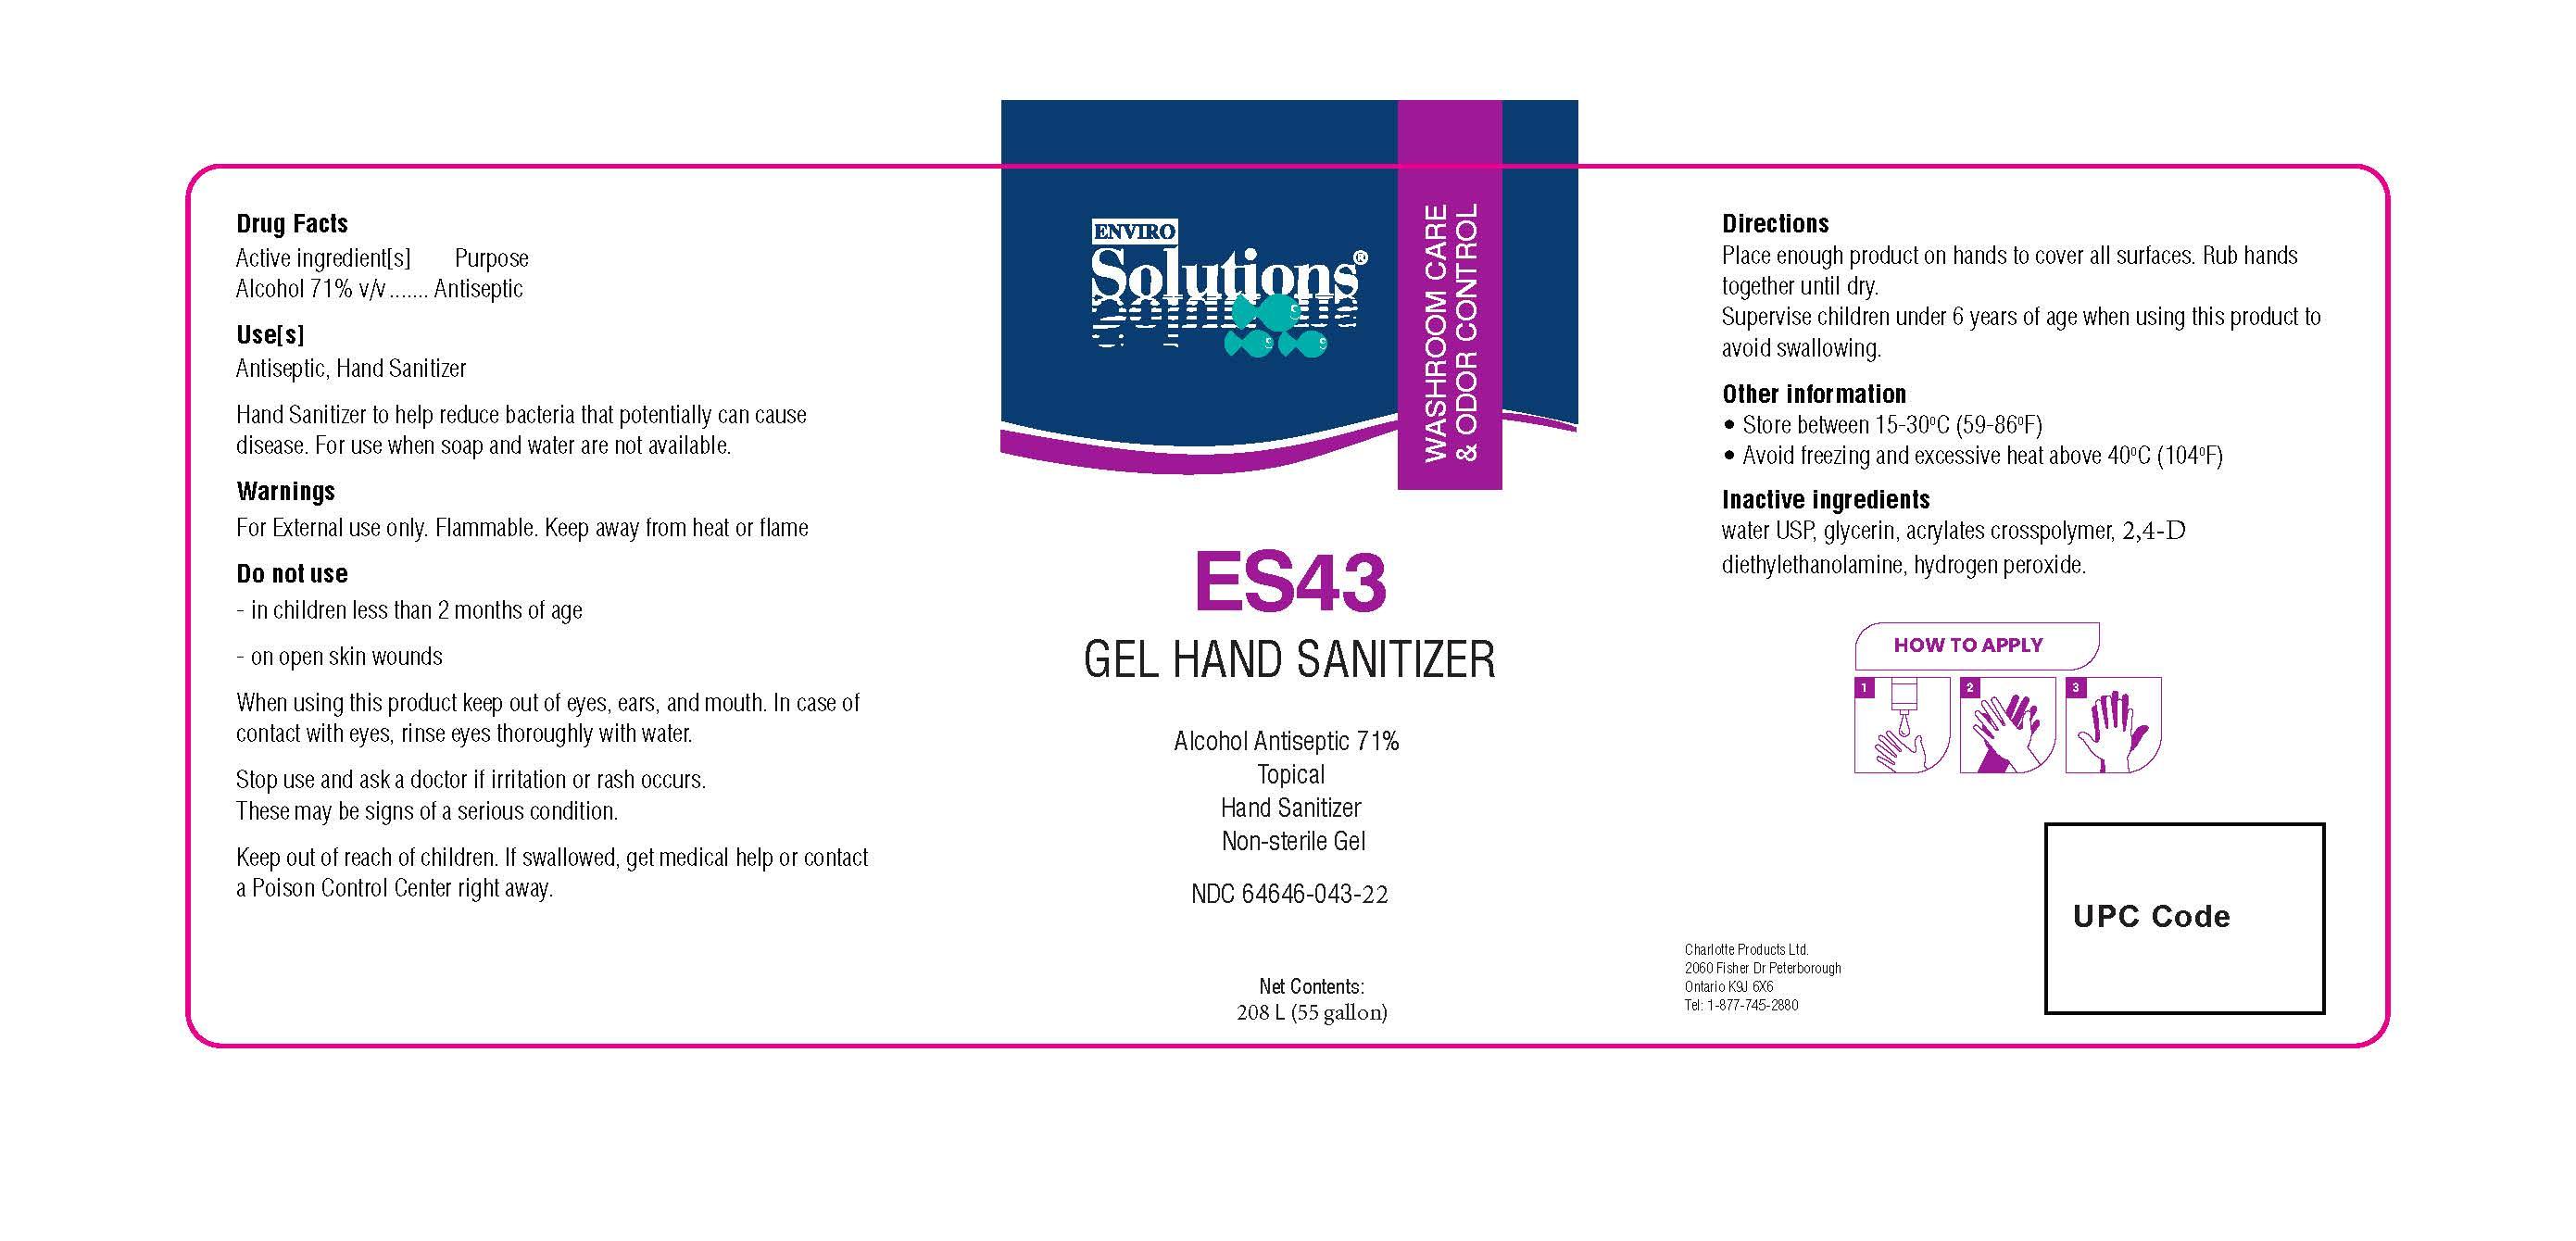 ES43 208 L Label